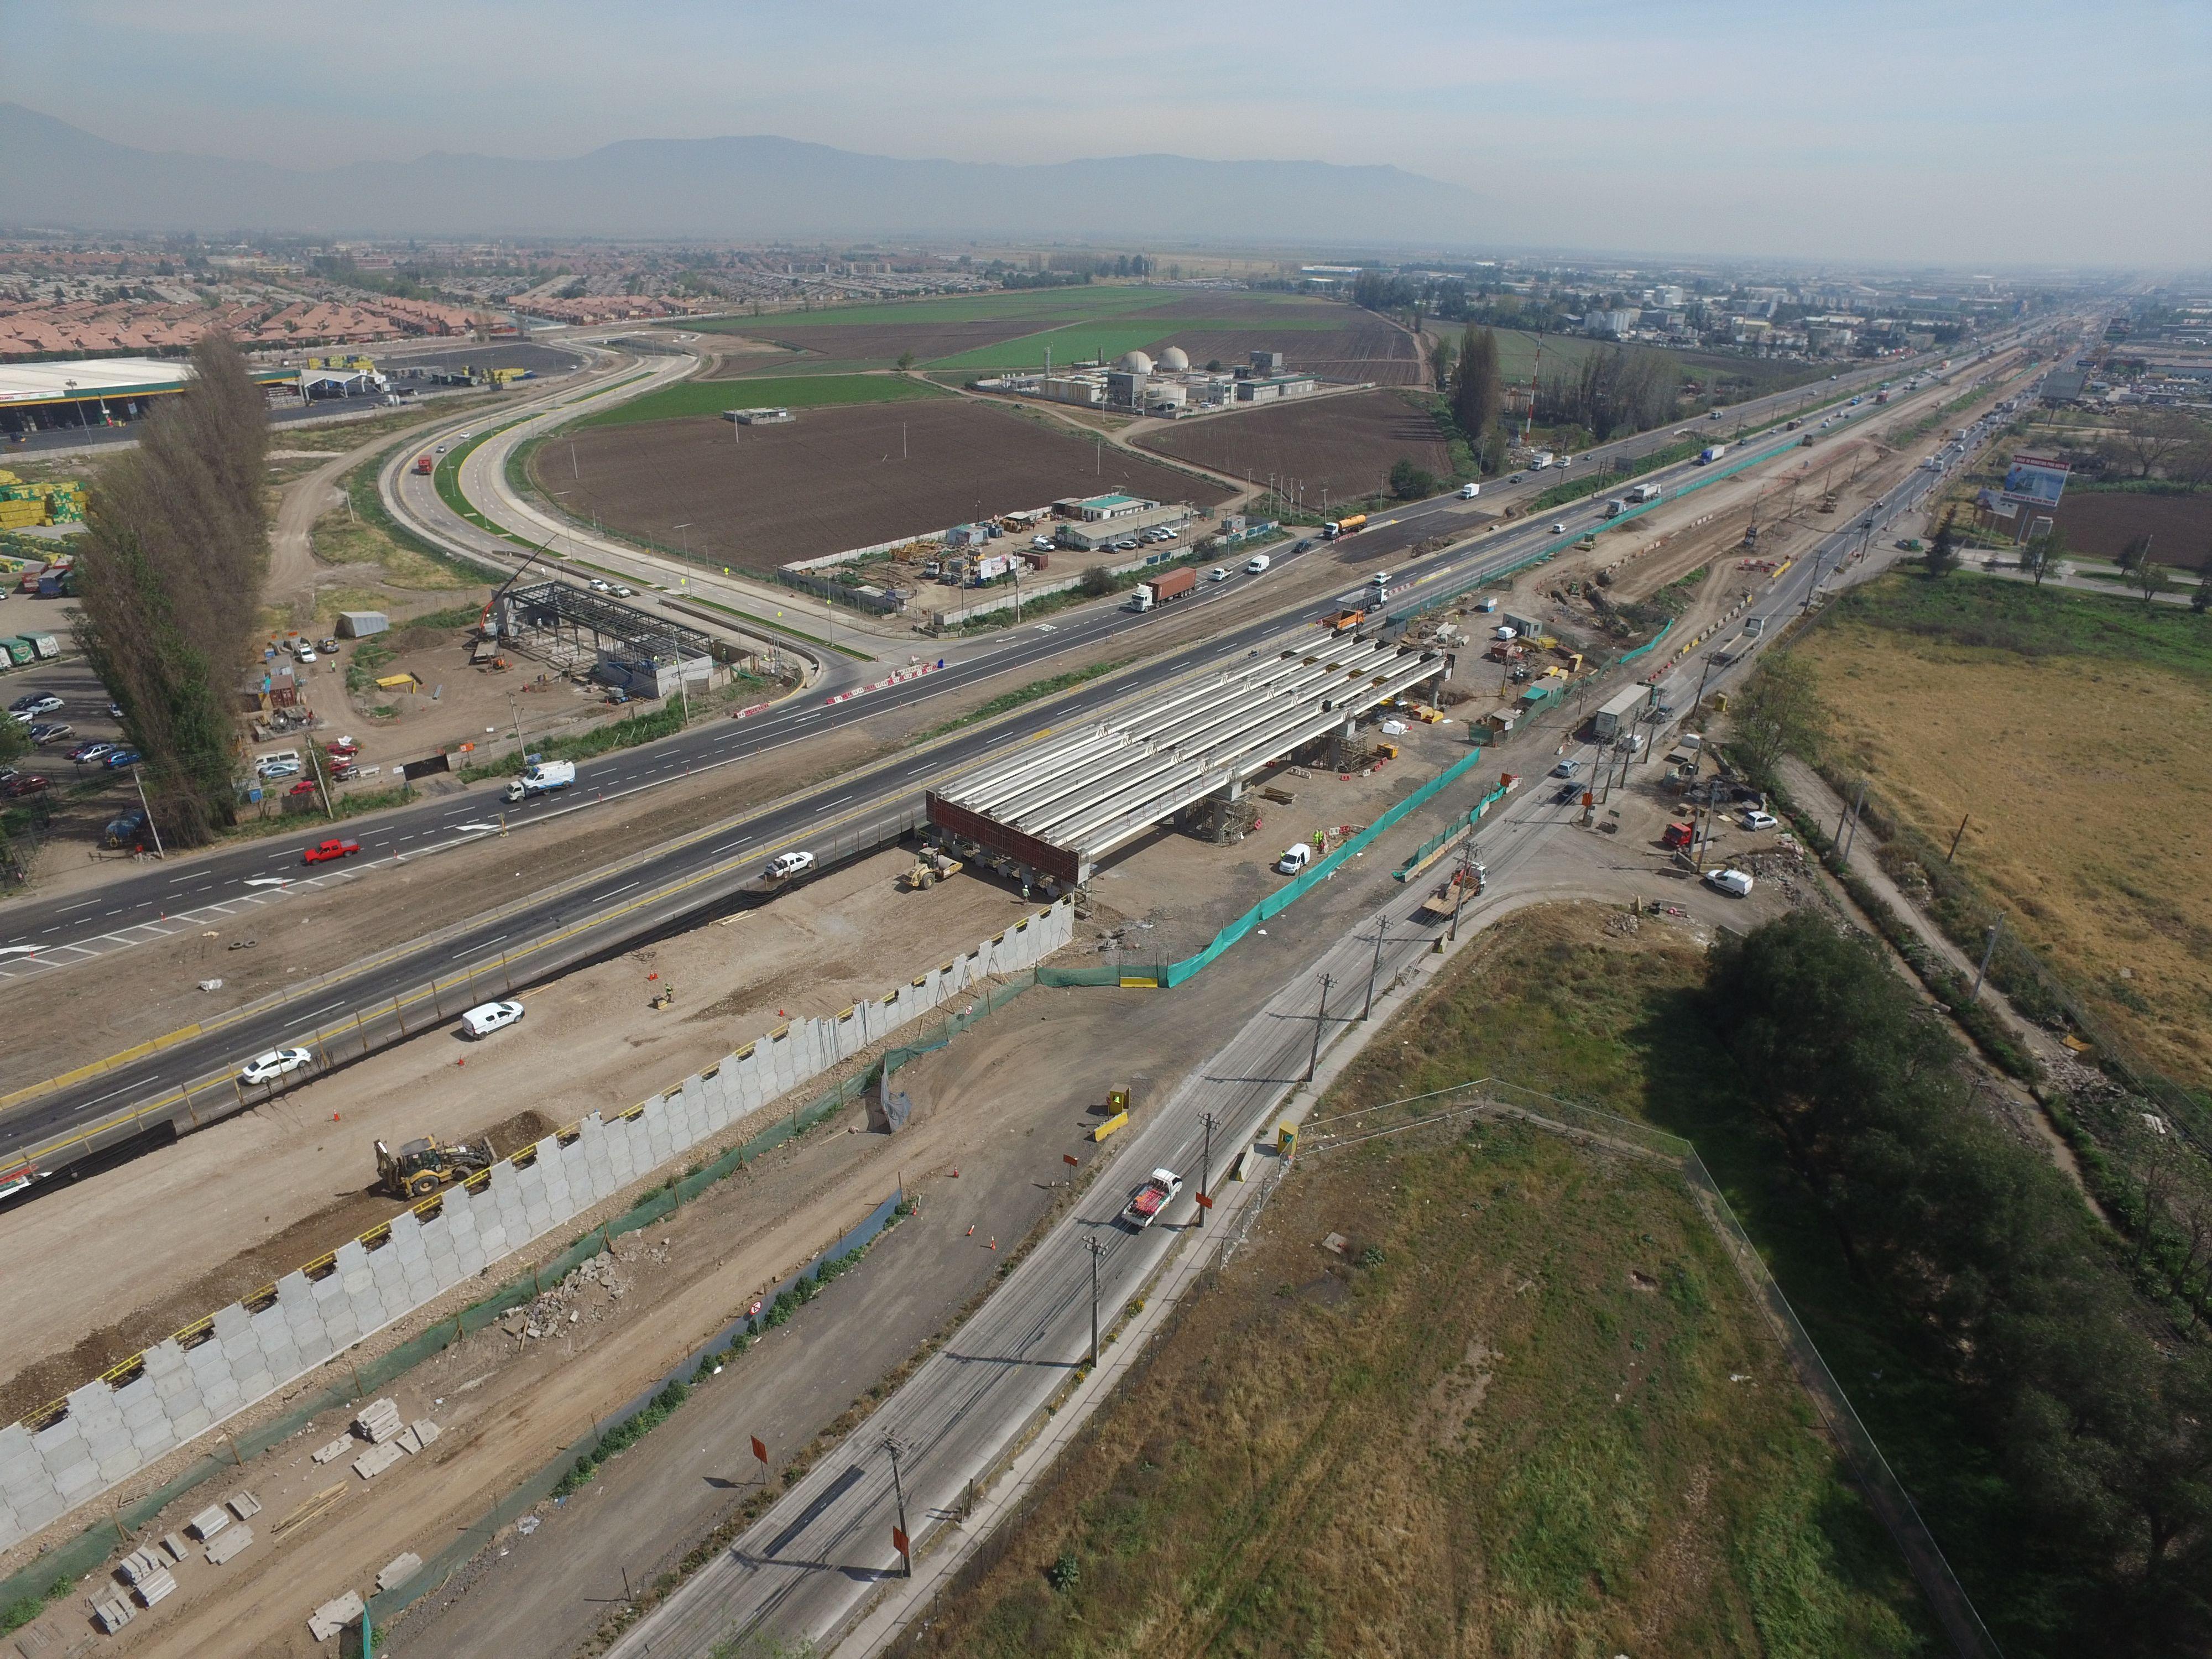 Inspeccion Vial Tramo Peaje Lampa Autopista A Vespucio 17 Km